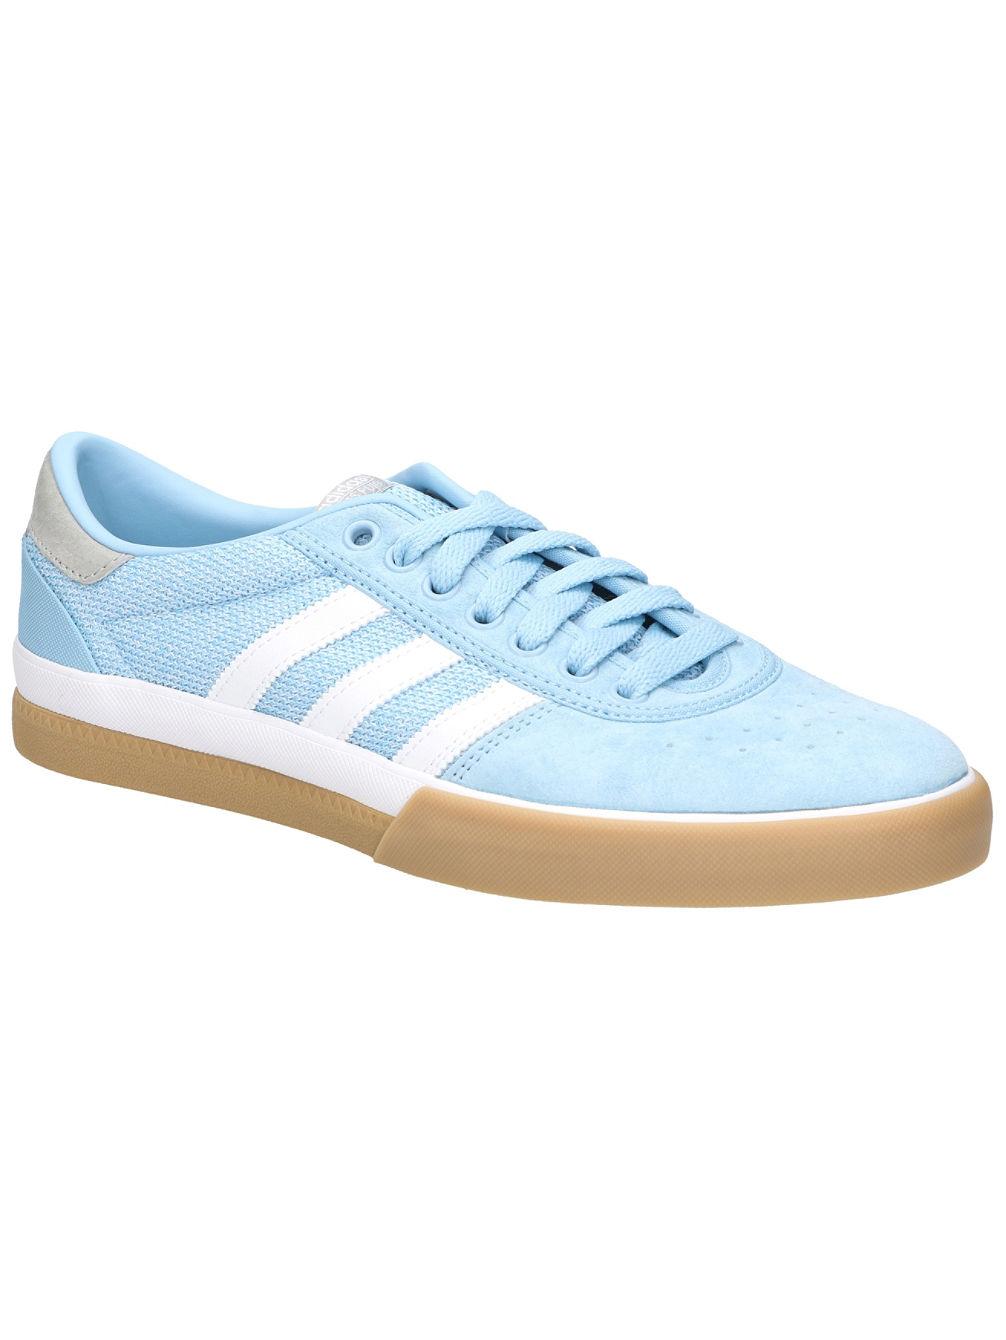 6dae4a45054ea0 Buy adidas Skateboarding Lucas Premiere Skate Shoes online at blue -tomato.com